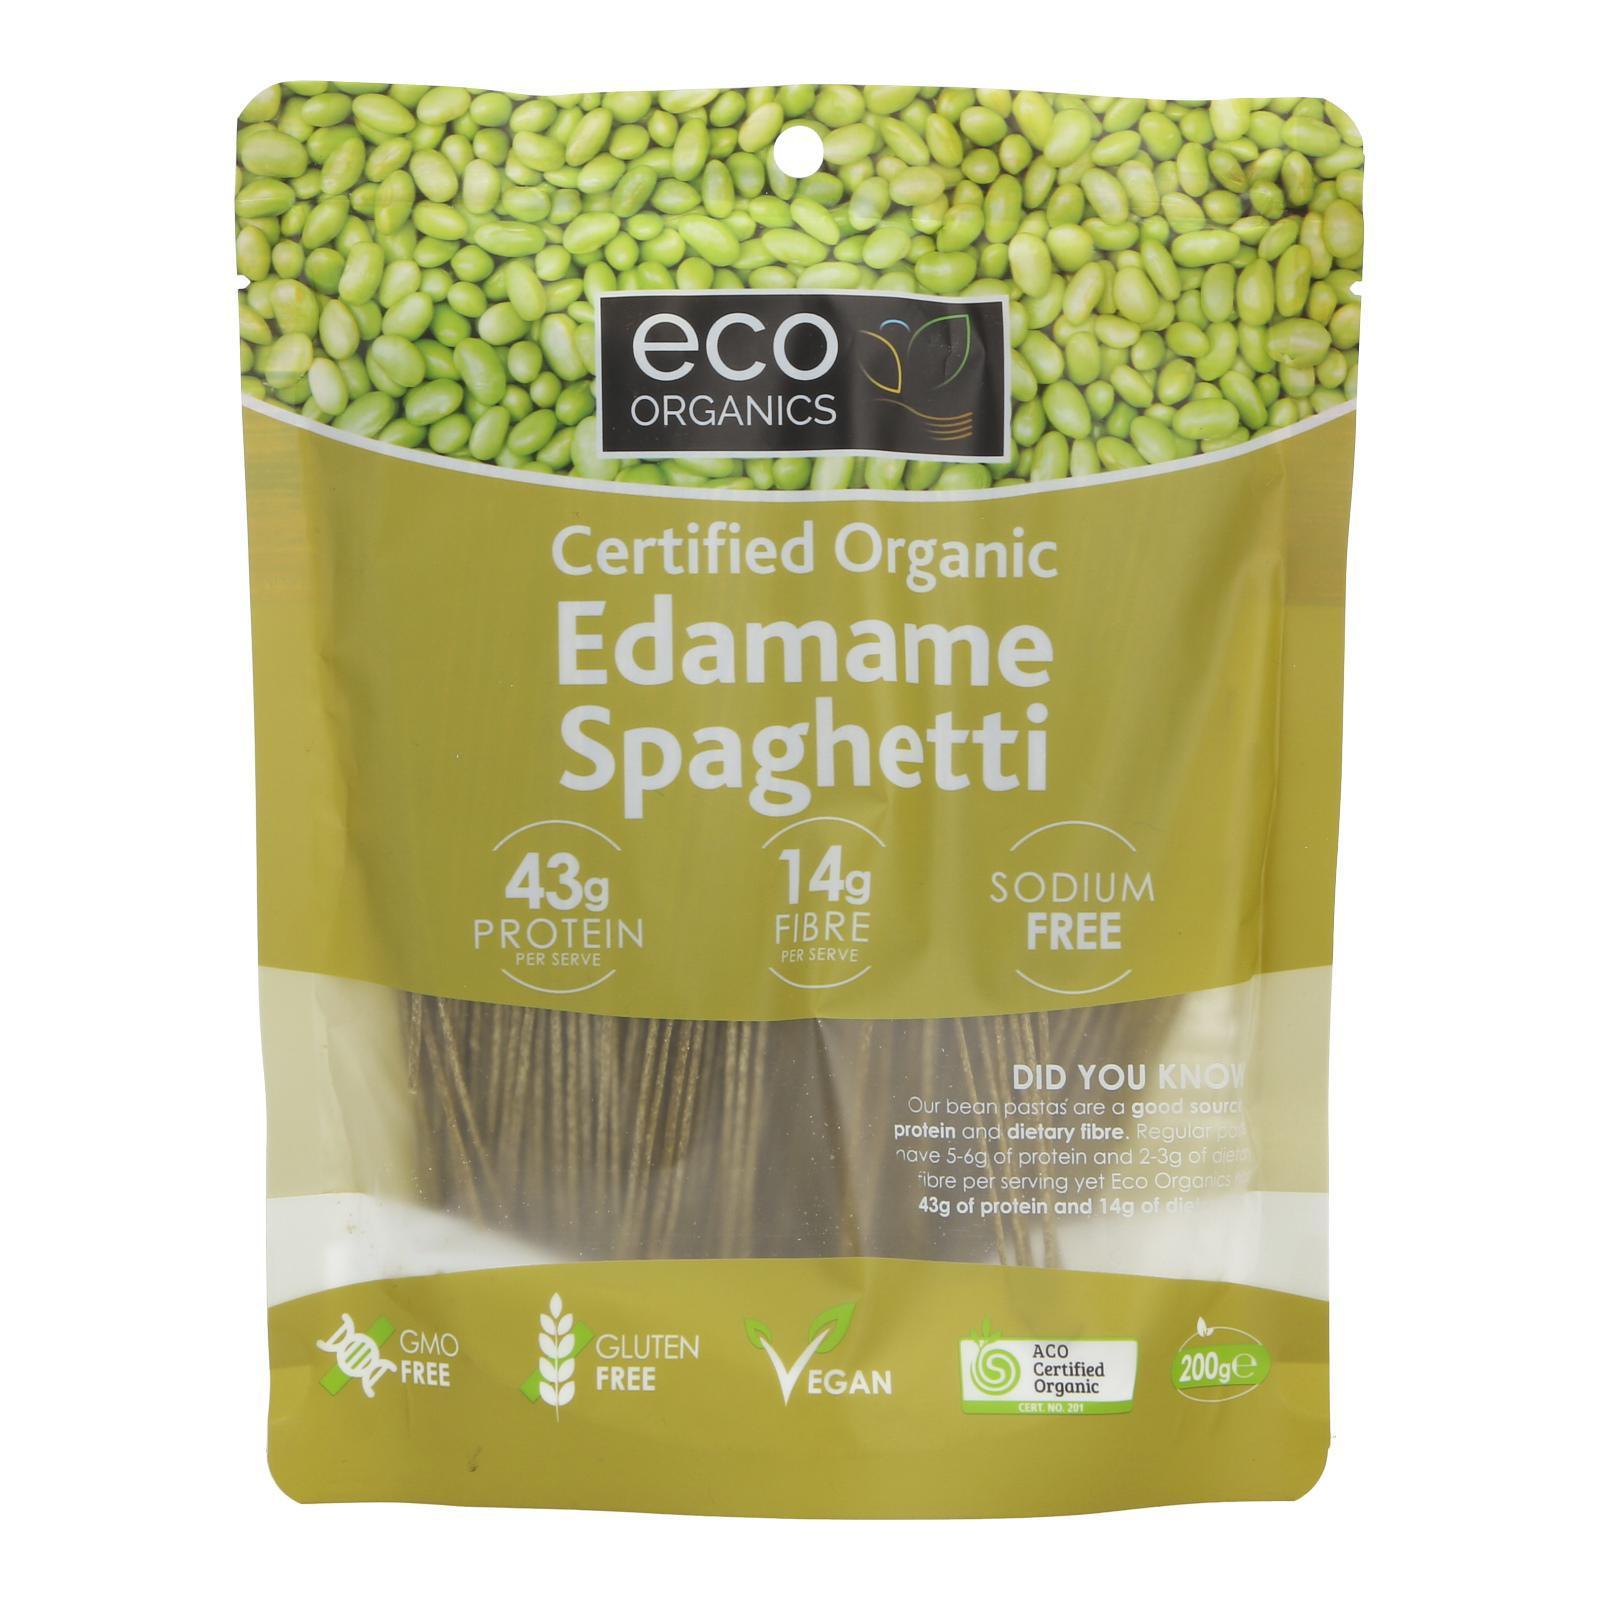 Eco Organics Edamame Spaghetti - By Wholesome Harvest